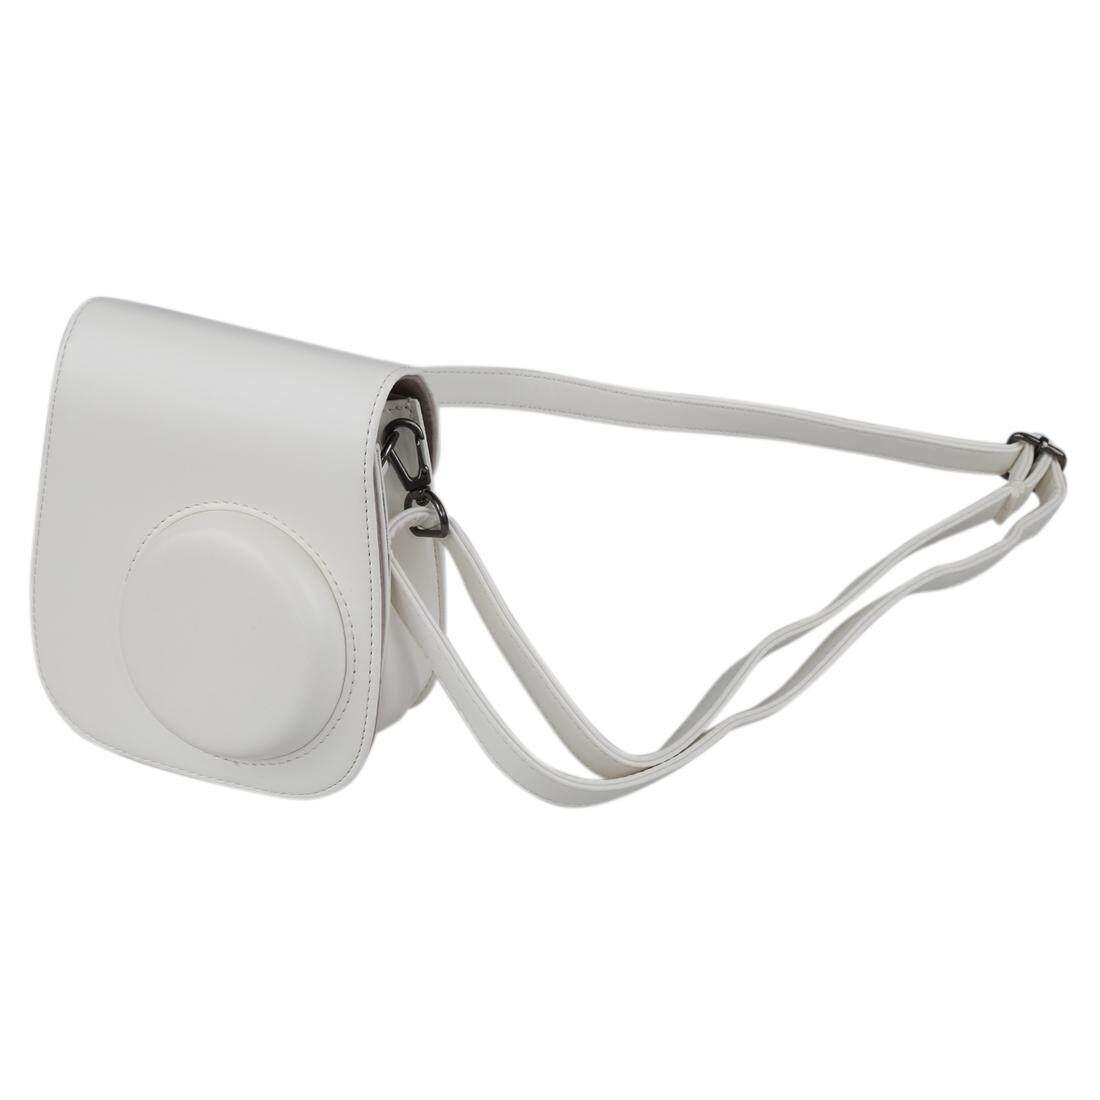 Tas Wadah Kamera Cover untuk Fujifilm Instax Mini8 Mini8s Tas Selempang Putih